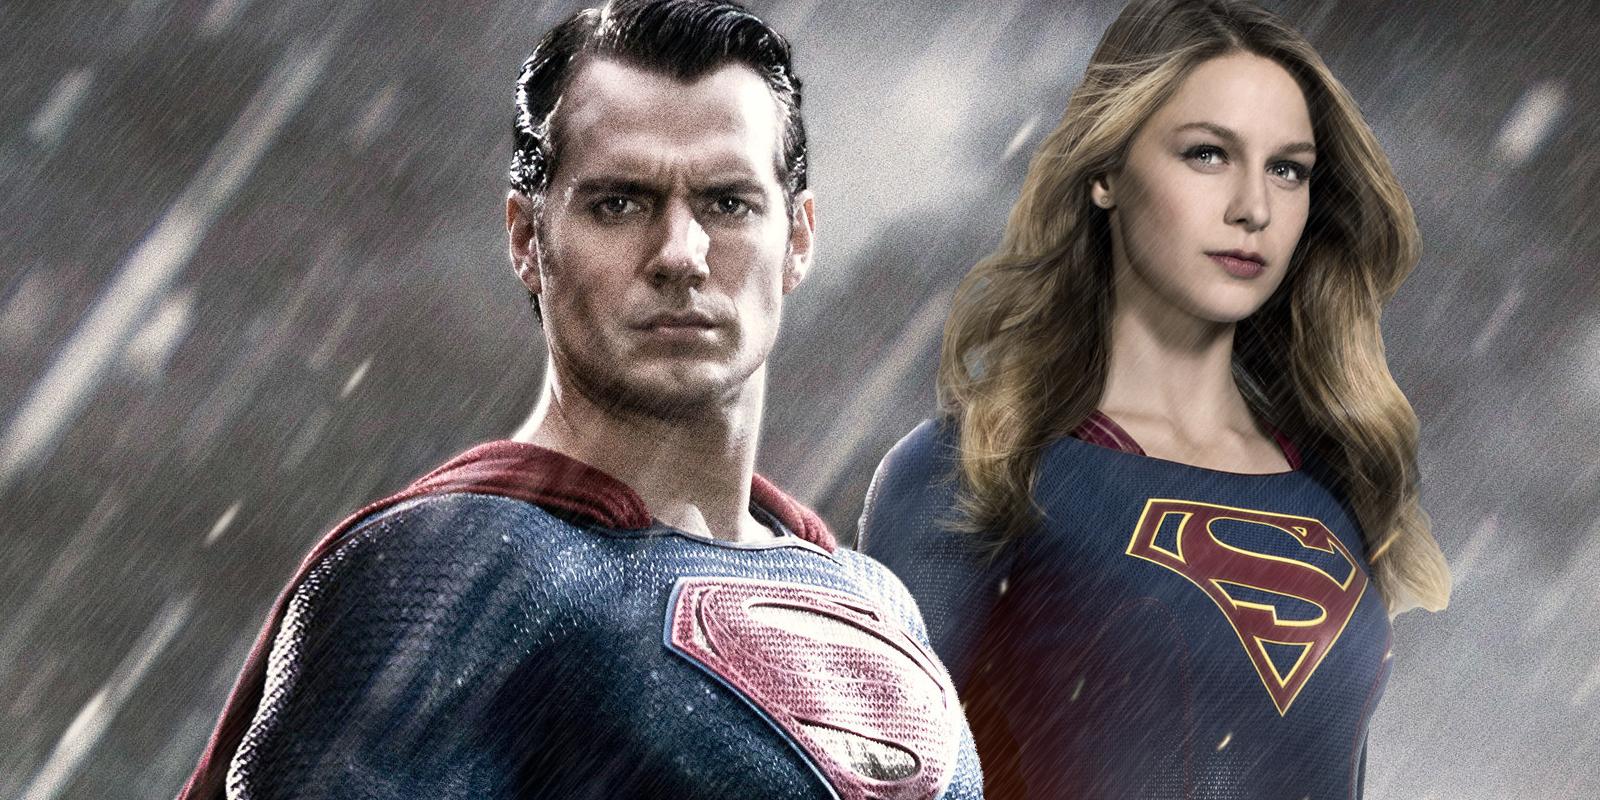 Henry Cavill and Melissa Benoist Man of Steel